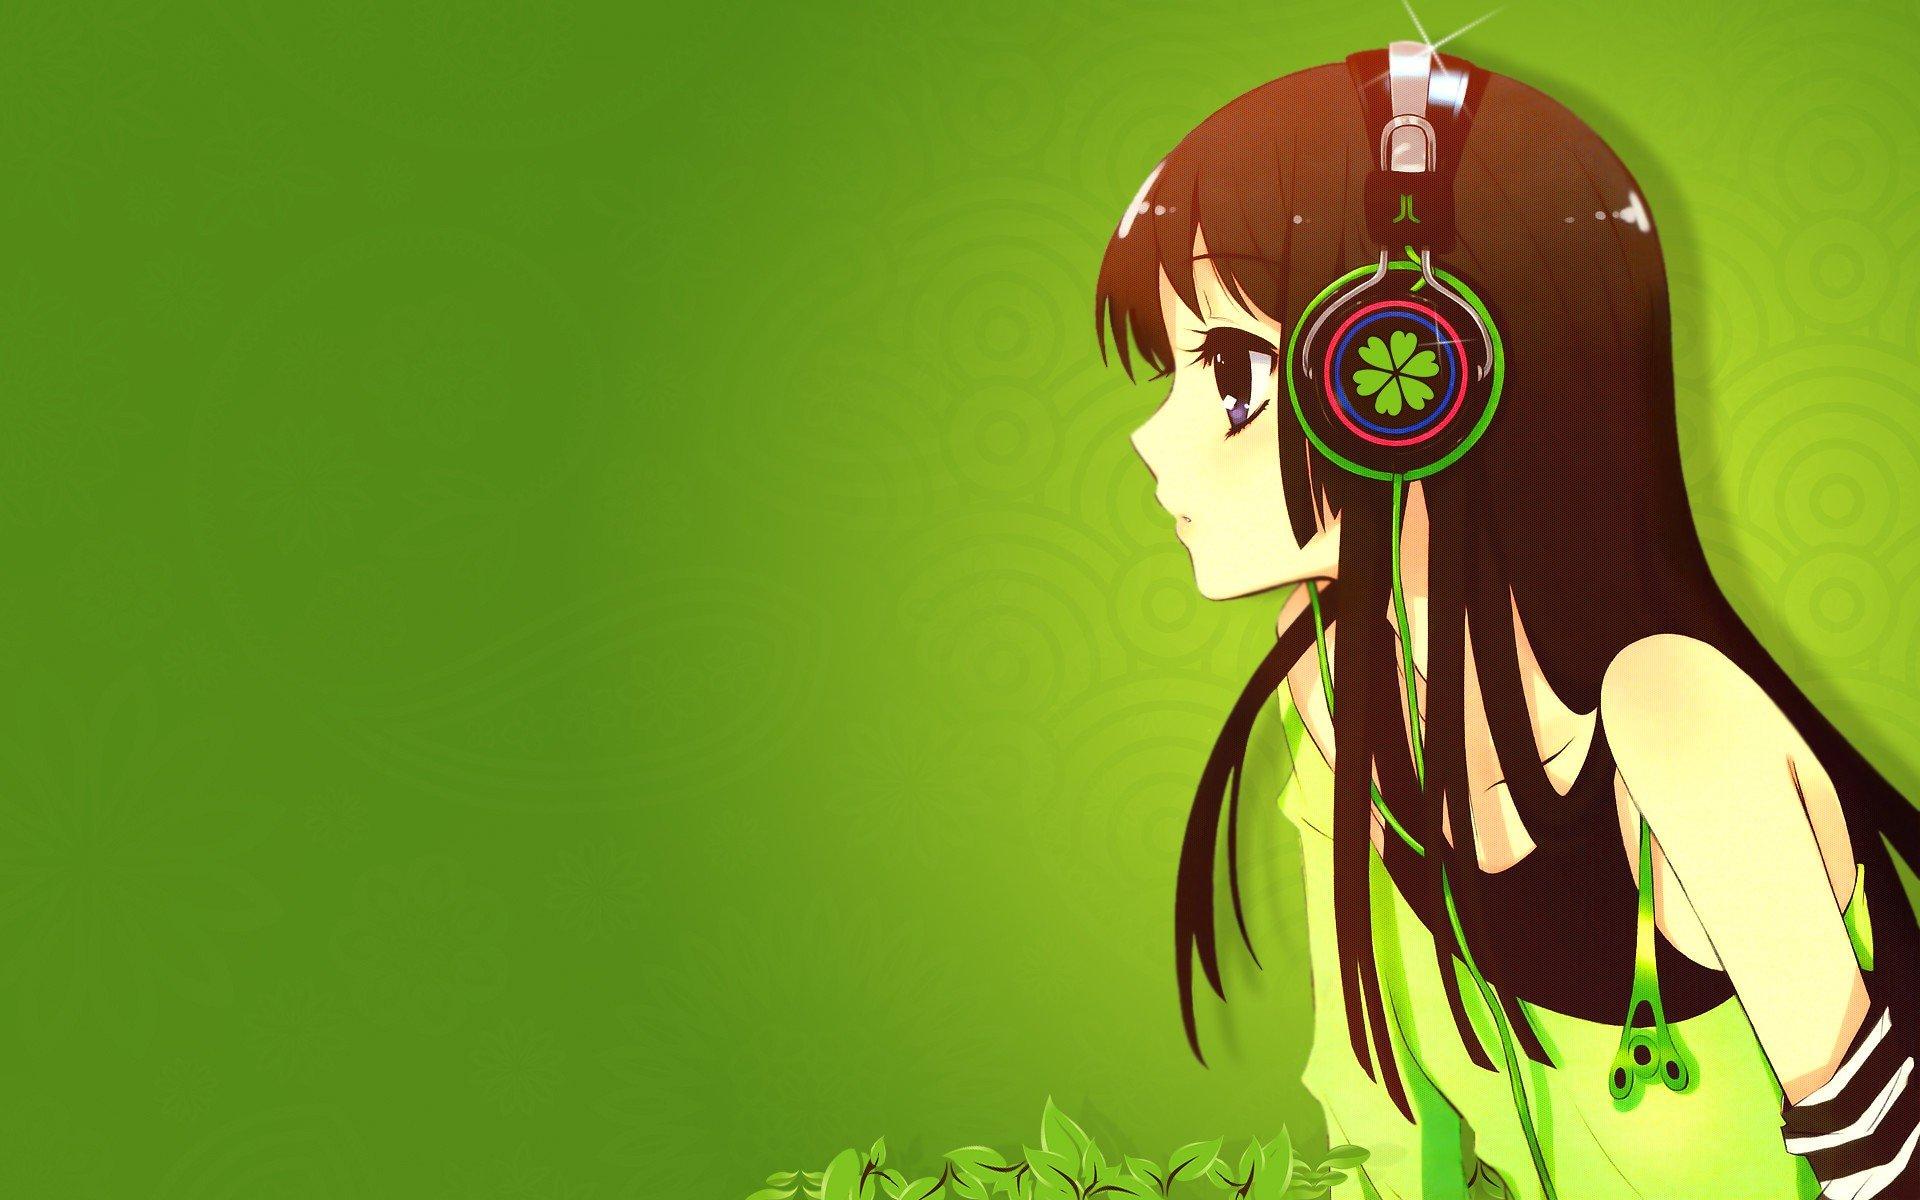 Download Wallpaper Cute Anime HD Desktop Wallpaper 1920x1200